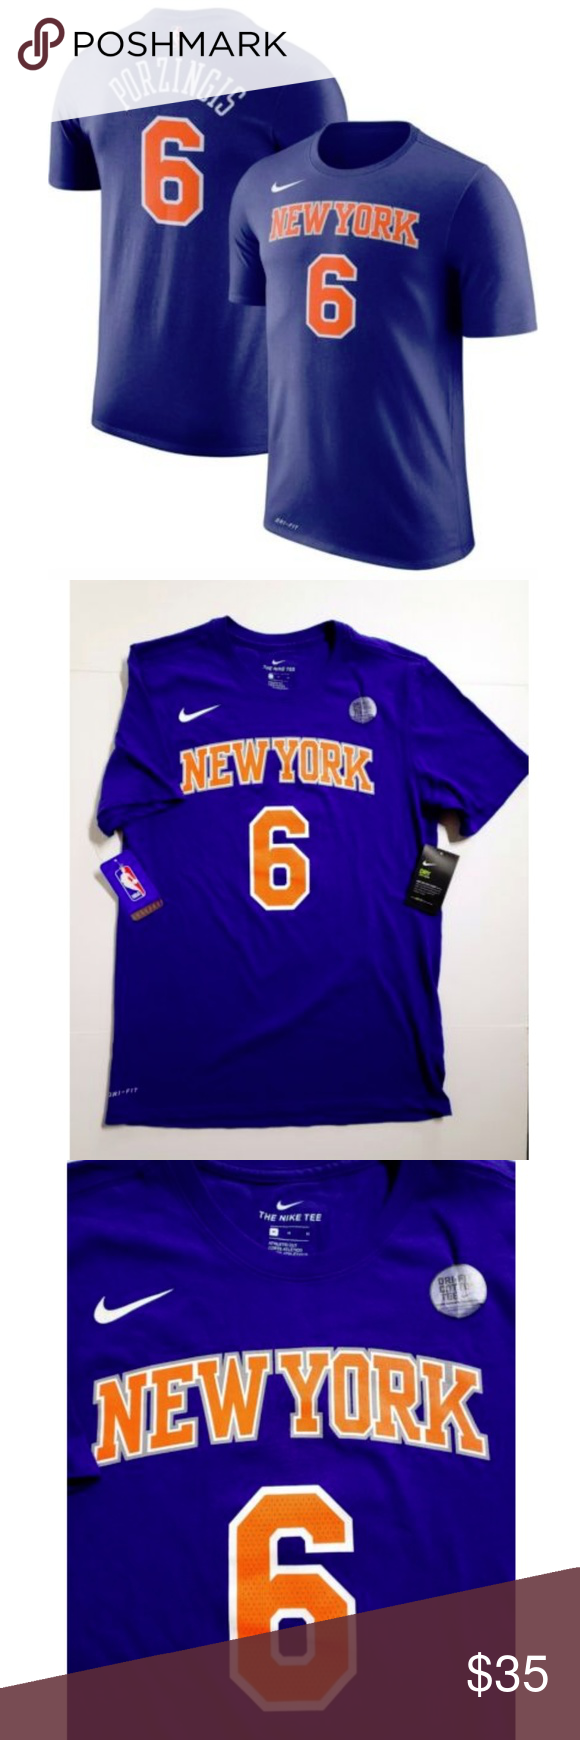 2ceba33f8 Nike New York Knicks KRISTAPS PORZINGIS T-Shirt New with Tags Nike Dri-fit